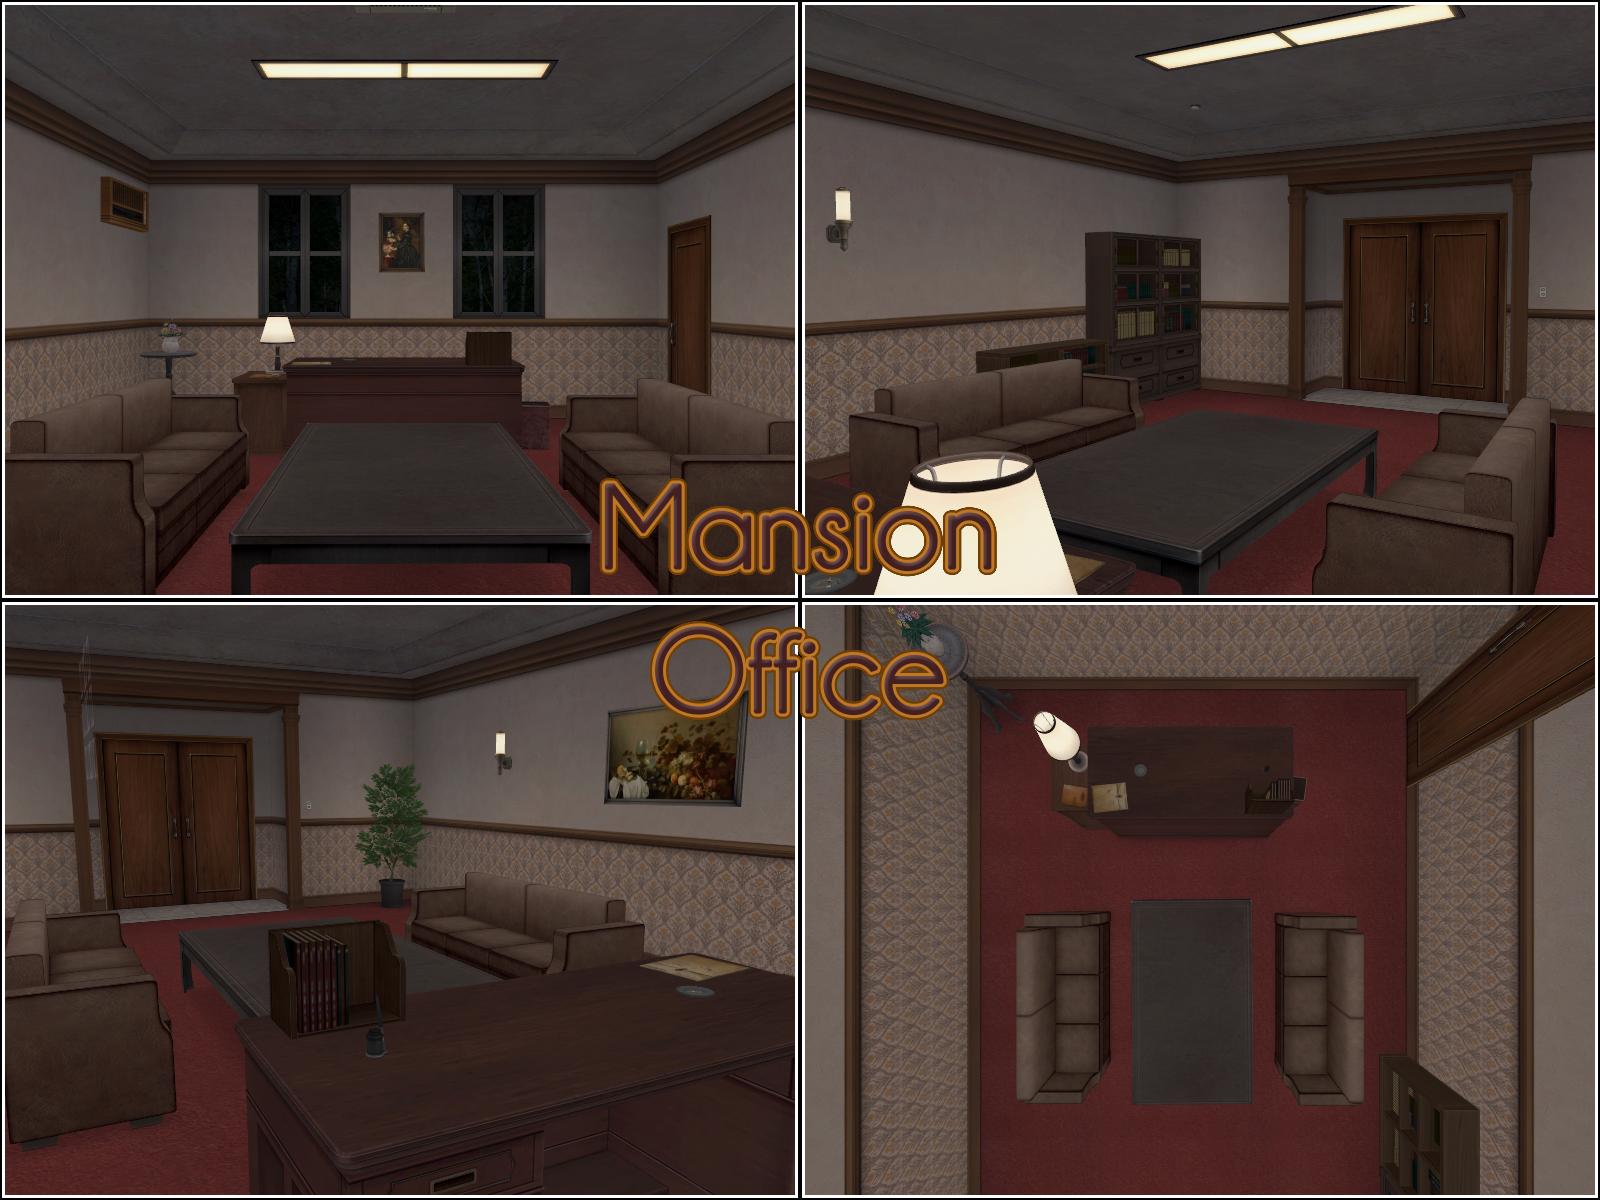 Mansion Office